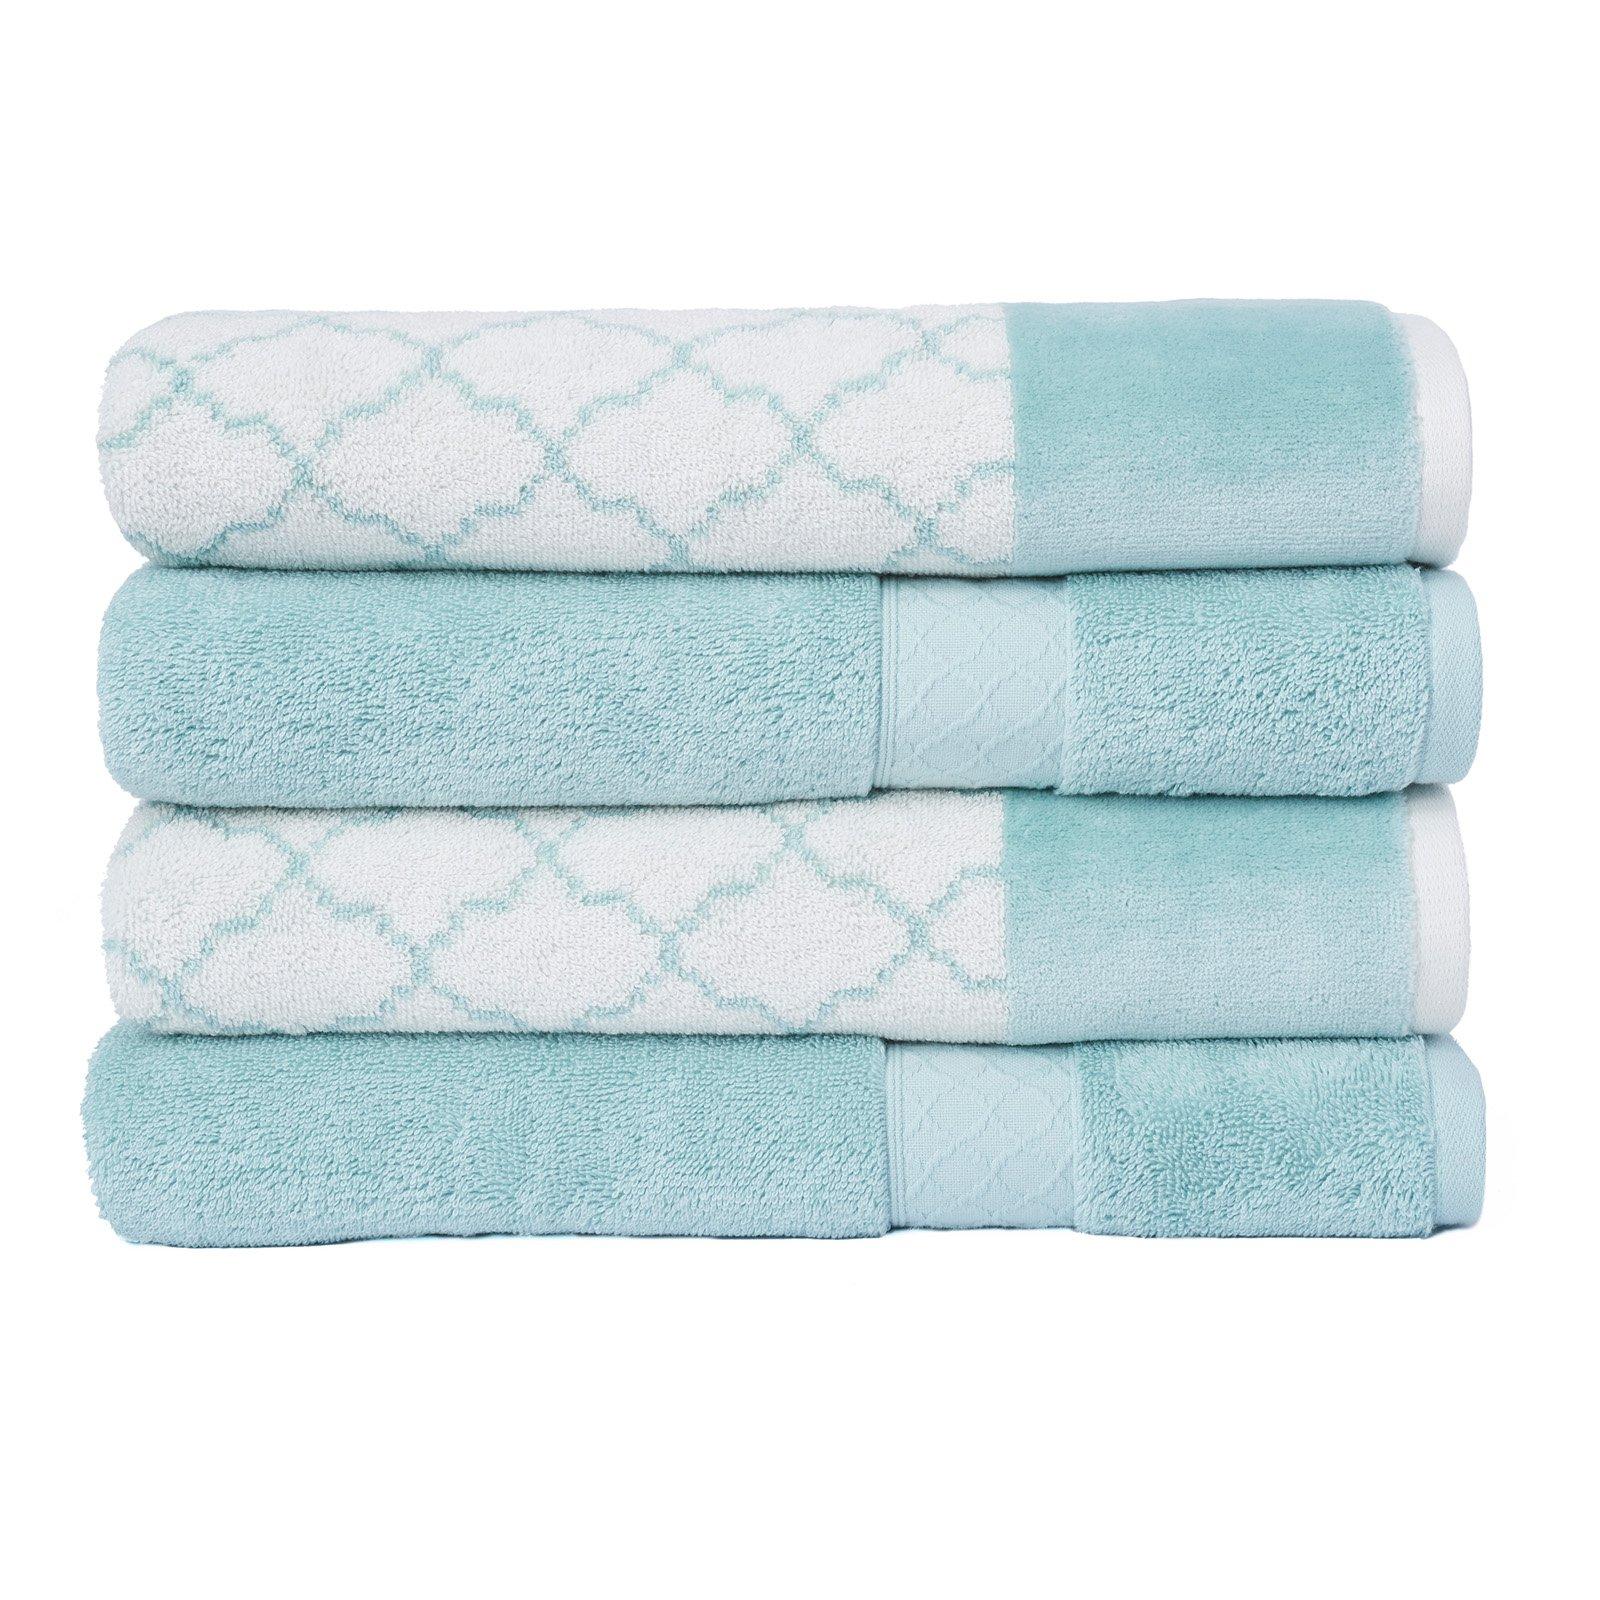 Loft By Loftex Lattice Jacquard Cotton 4 Piece Bath Towel Set Aqua